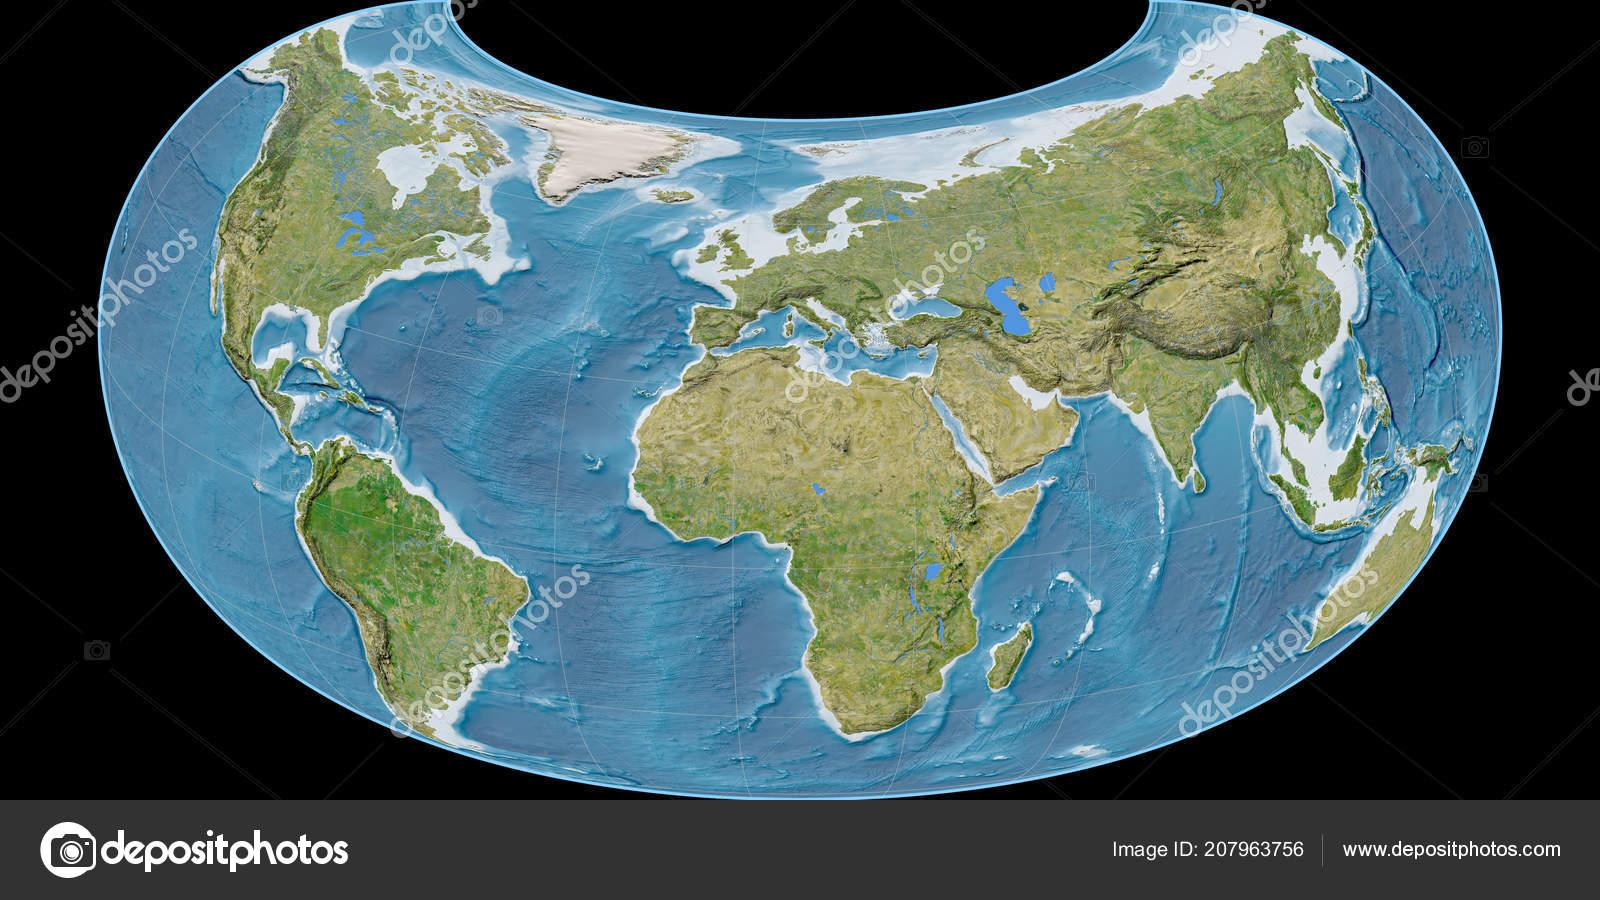 World map raisz armadillo projection centered east longitude world map raisz armadillo projection centered east longitude satellite imagery stock photo gumiabroncs Gallery